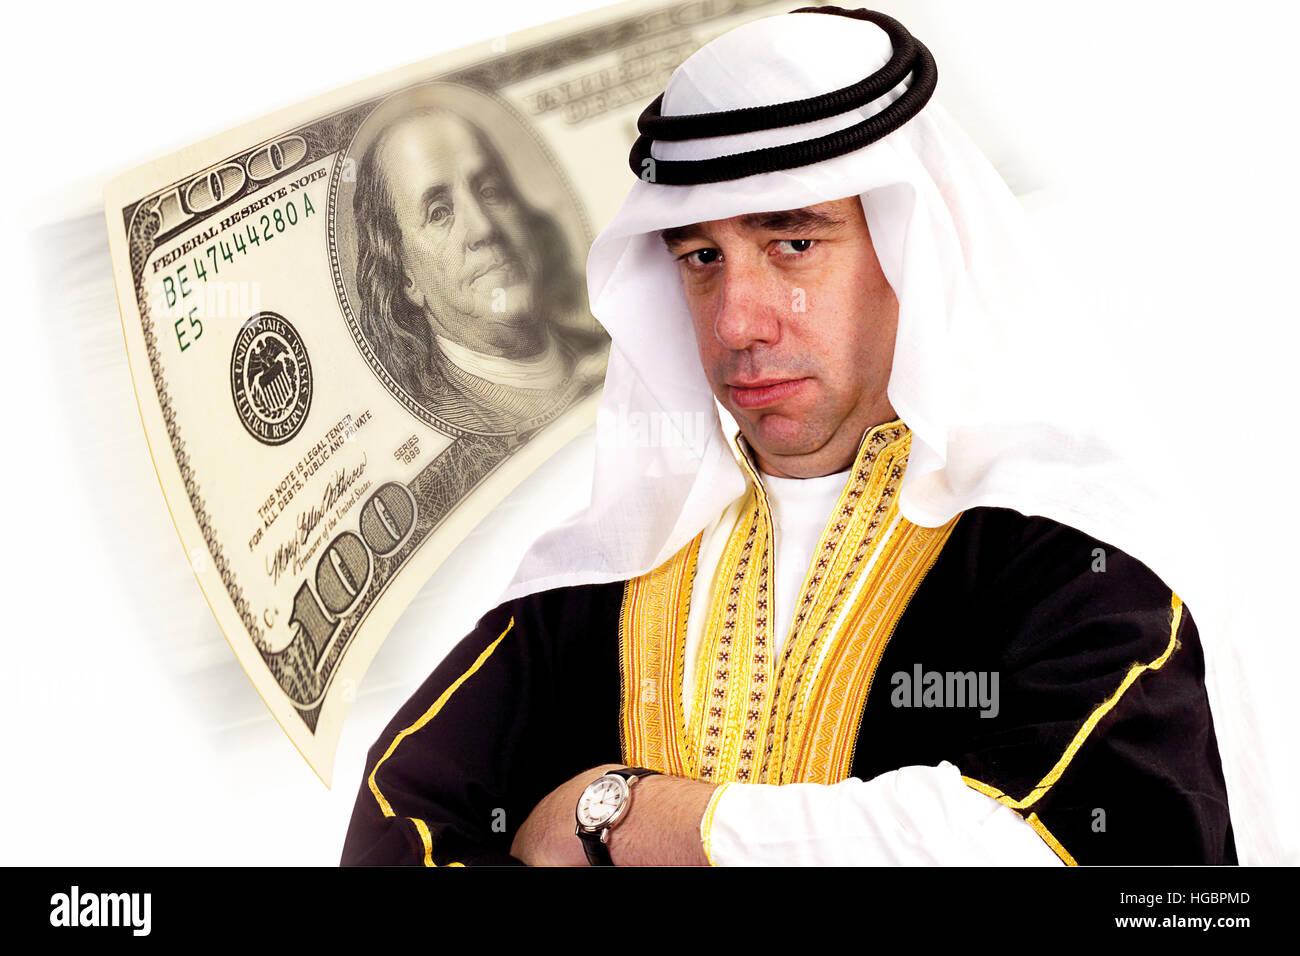 Sheikh with 100 U.S. dollar bill, composing shot Stock Photo